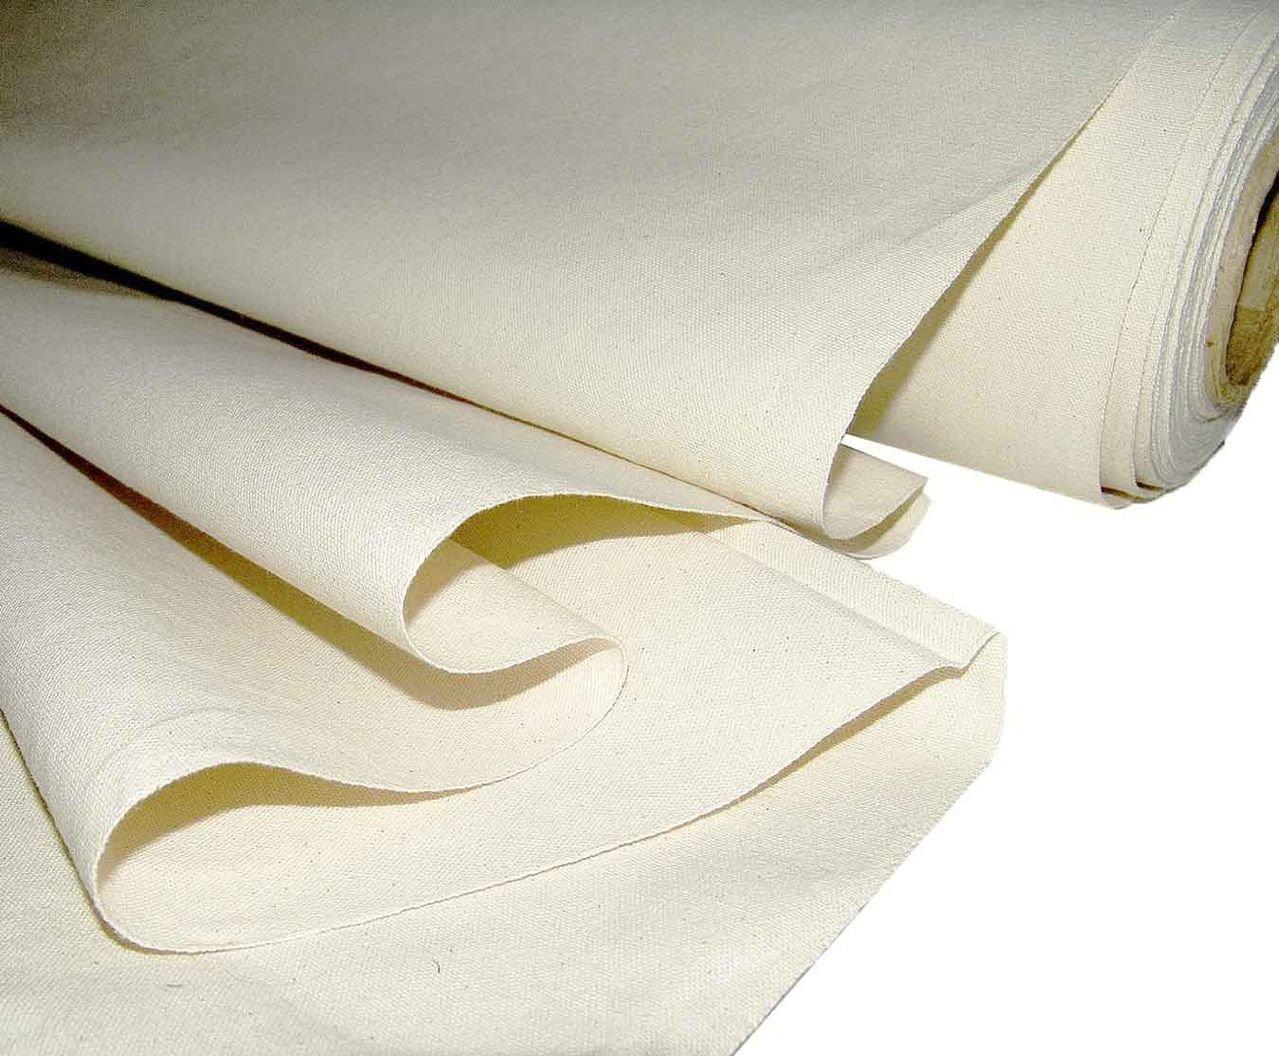 Mybecca Unprimed Cotton Canvas Fabric 7oz Natural Duck Cloth 63'' Wide, 10 Yards